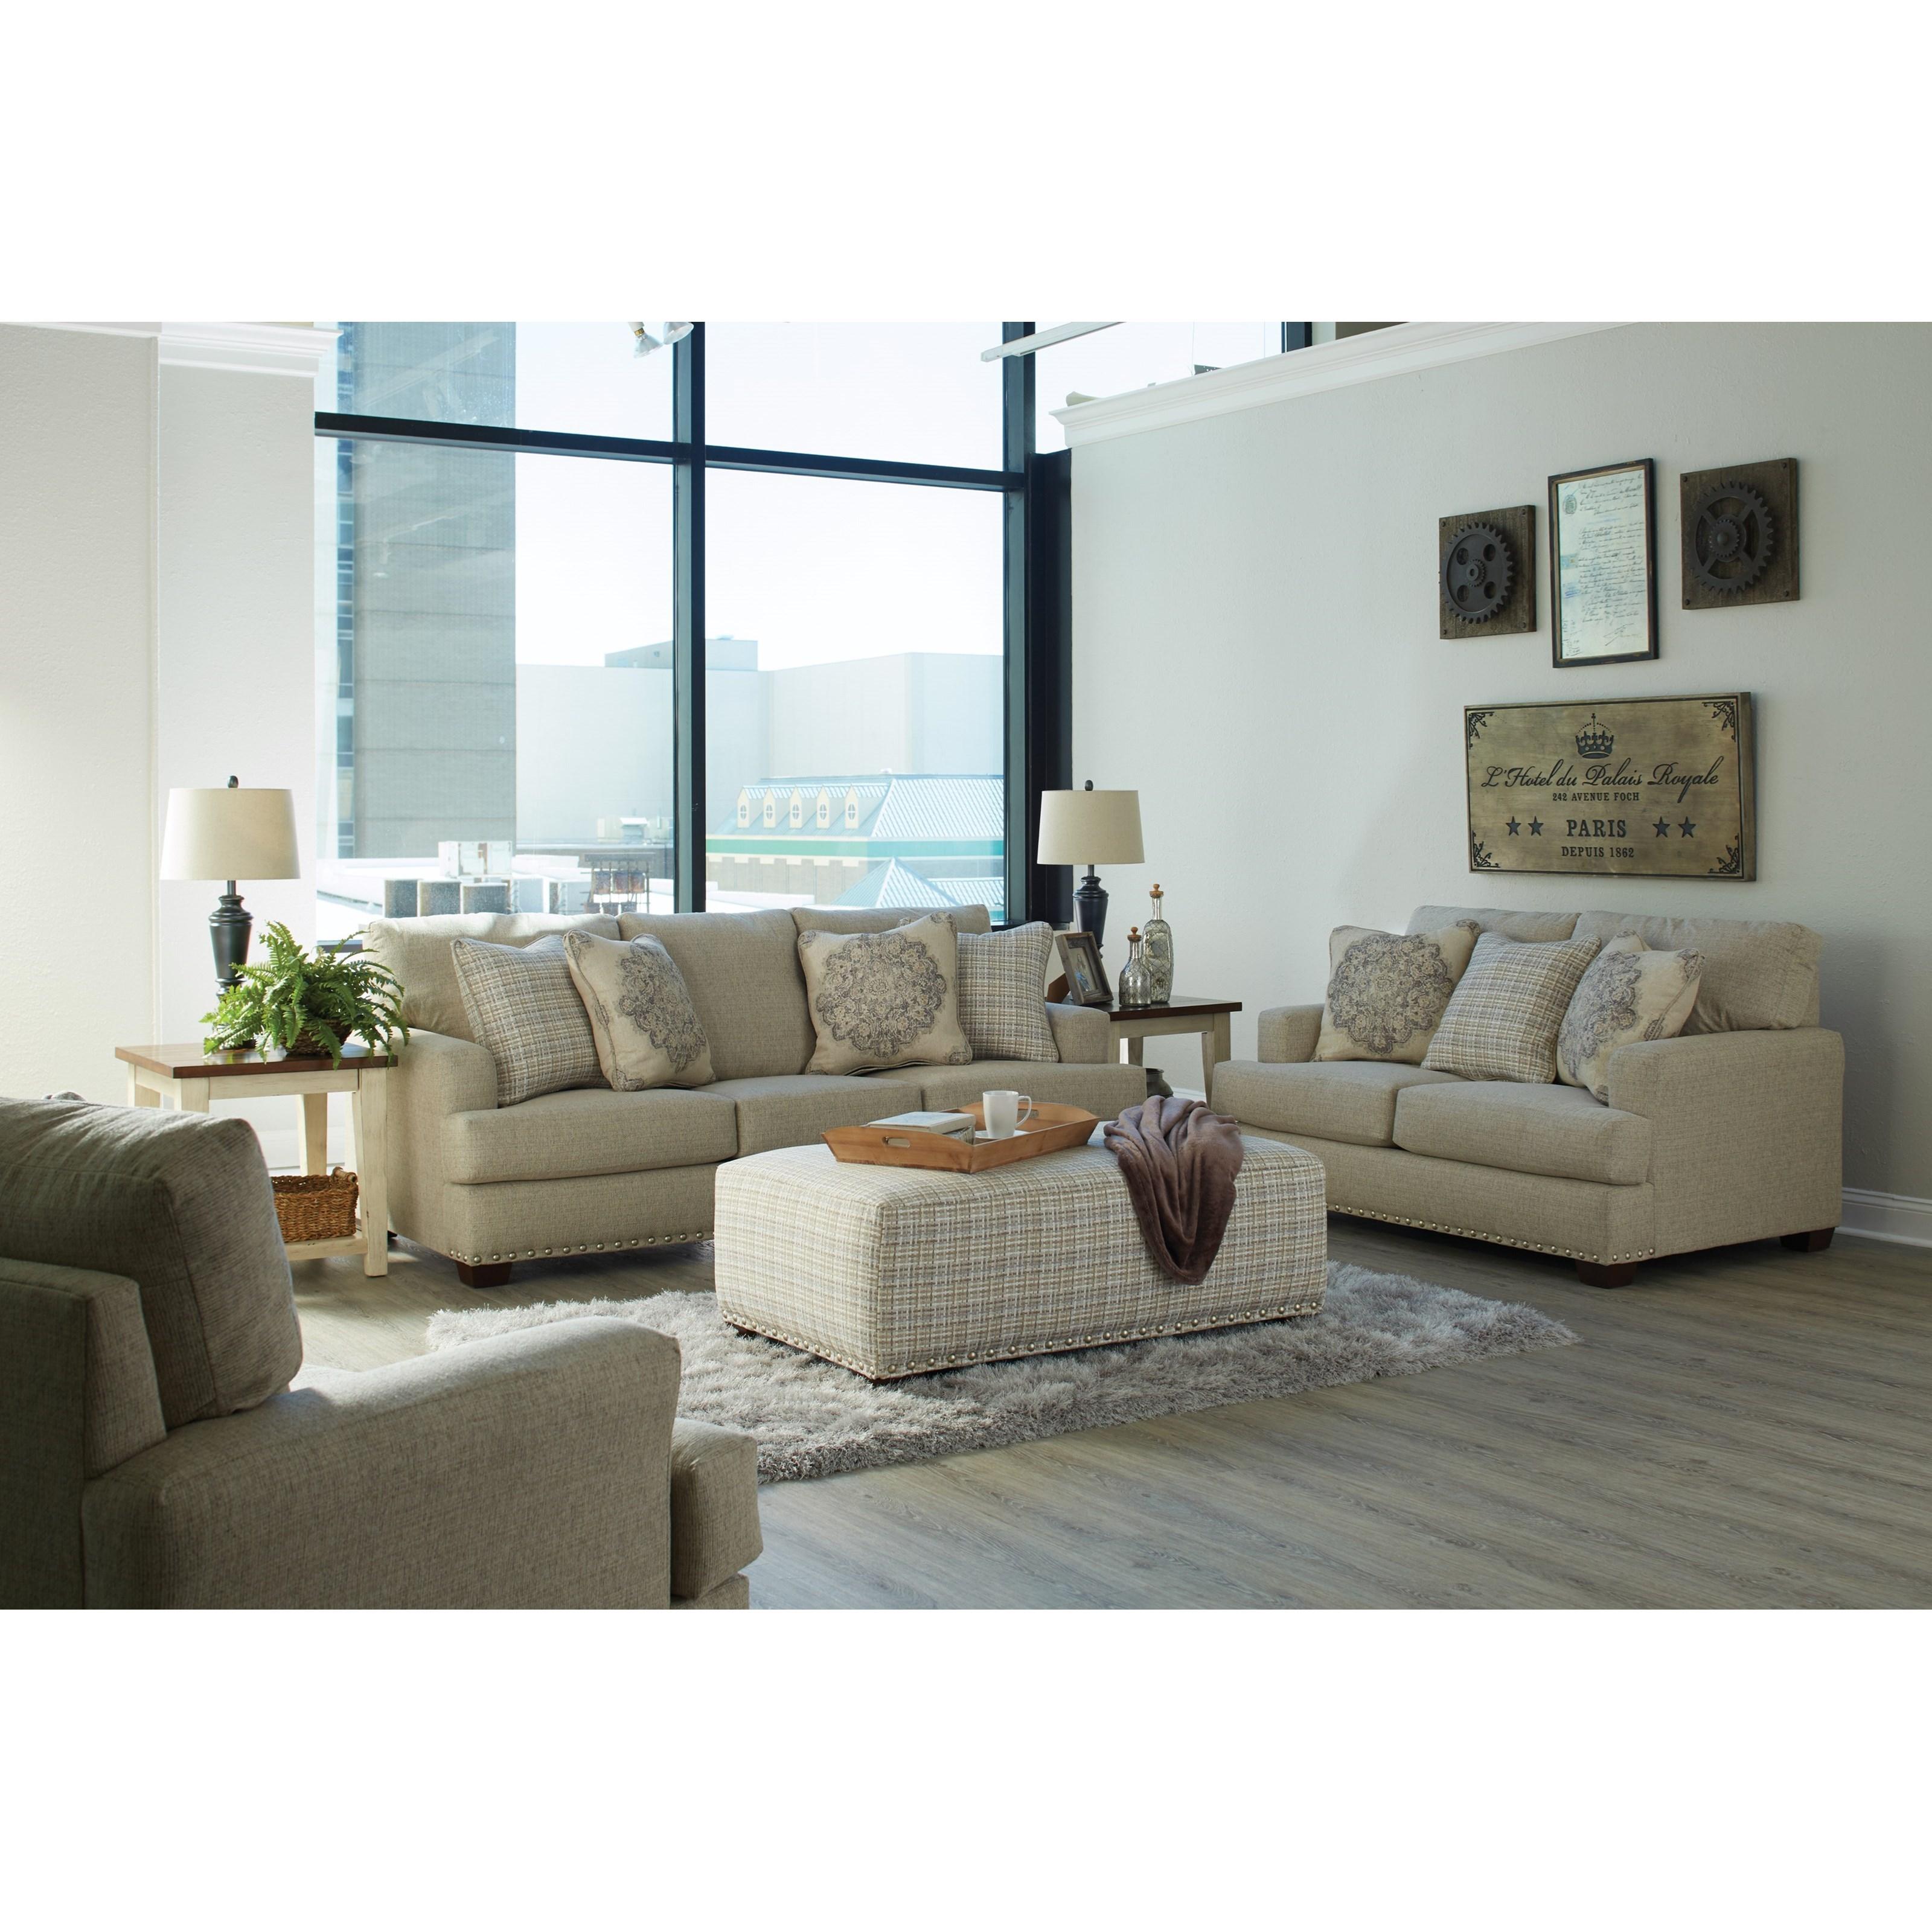 Jackson Furniture Newberg 4421-03 Upholstered Sofa With